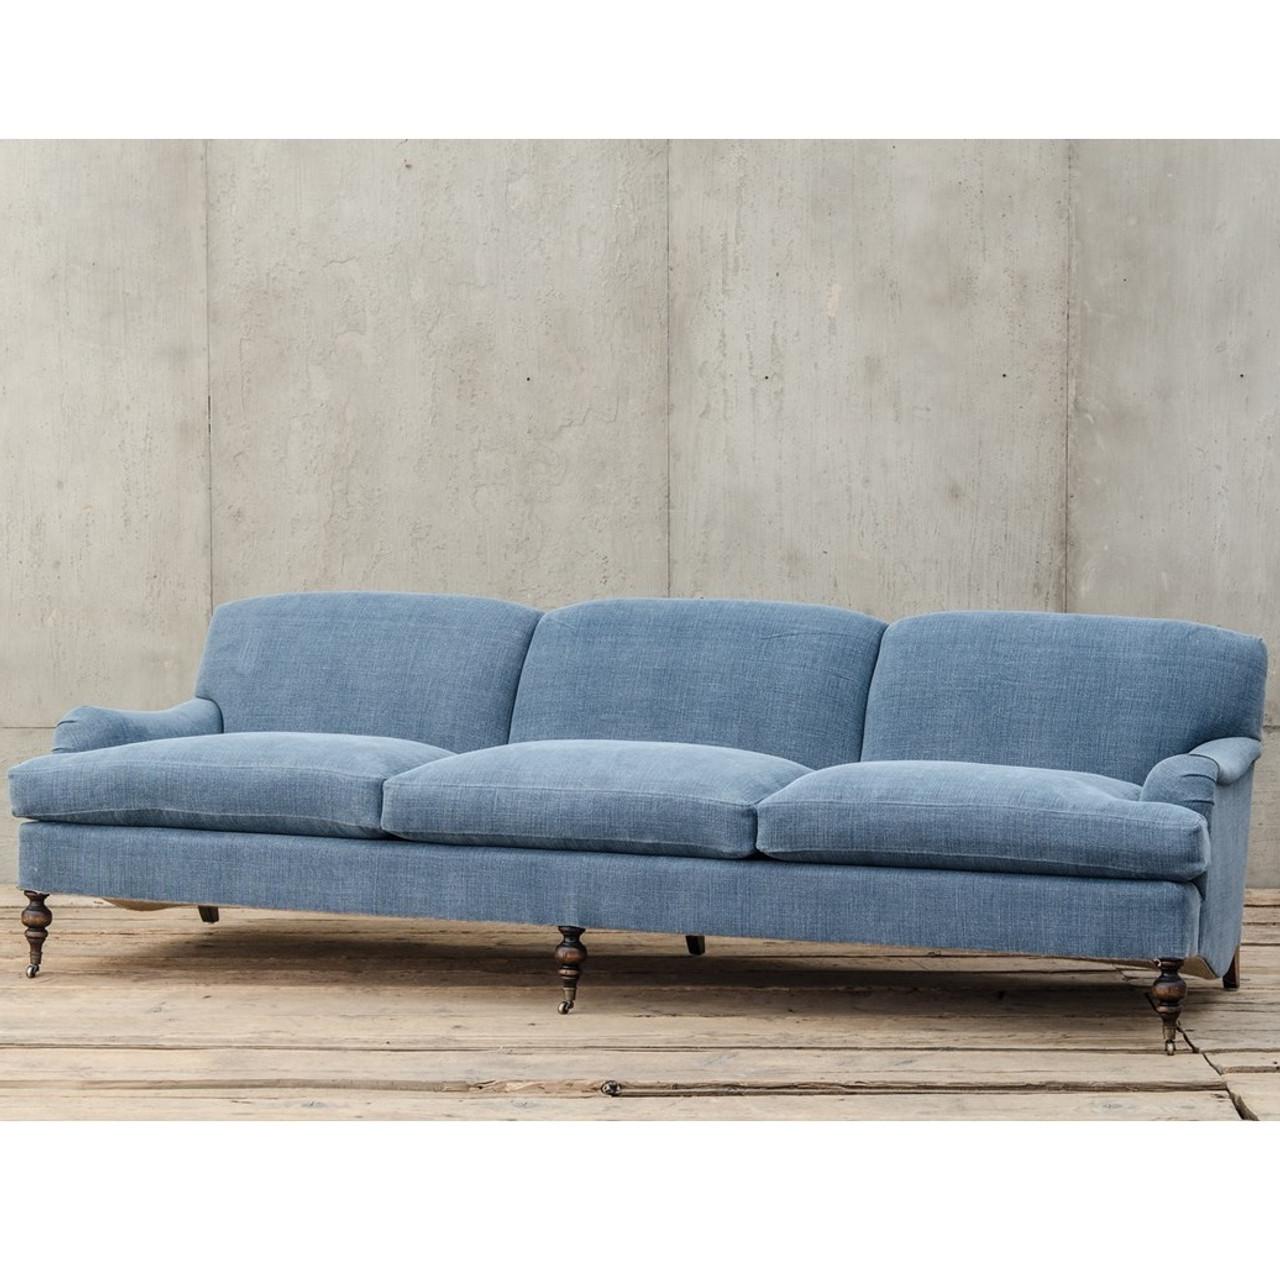 Charmant Professor Plumu0027s Blue Linen Upholstered English Roll Arm Sofa